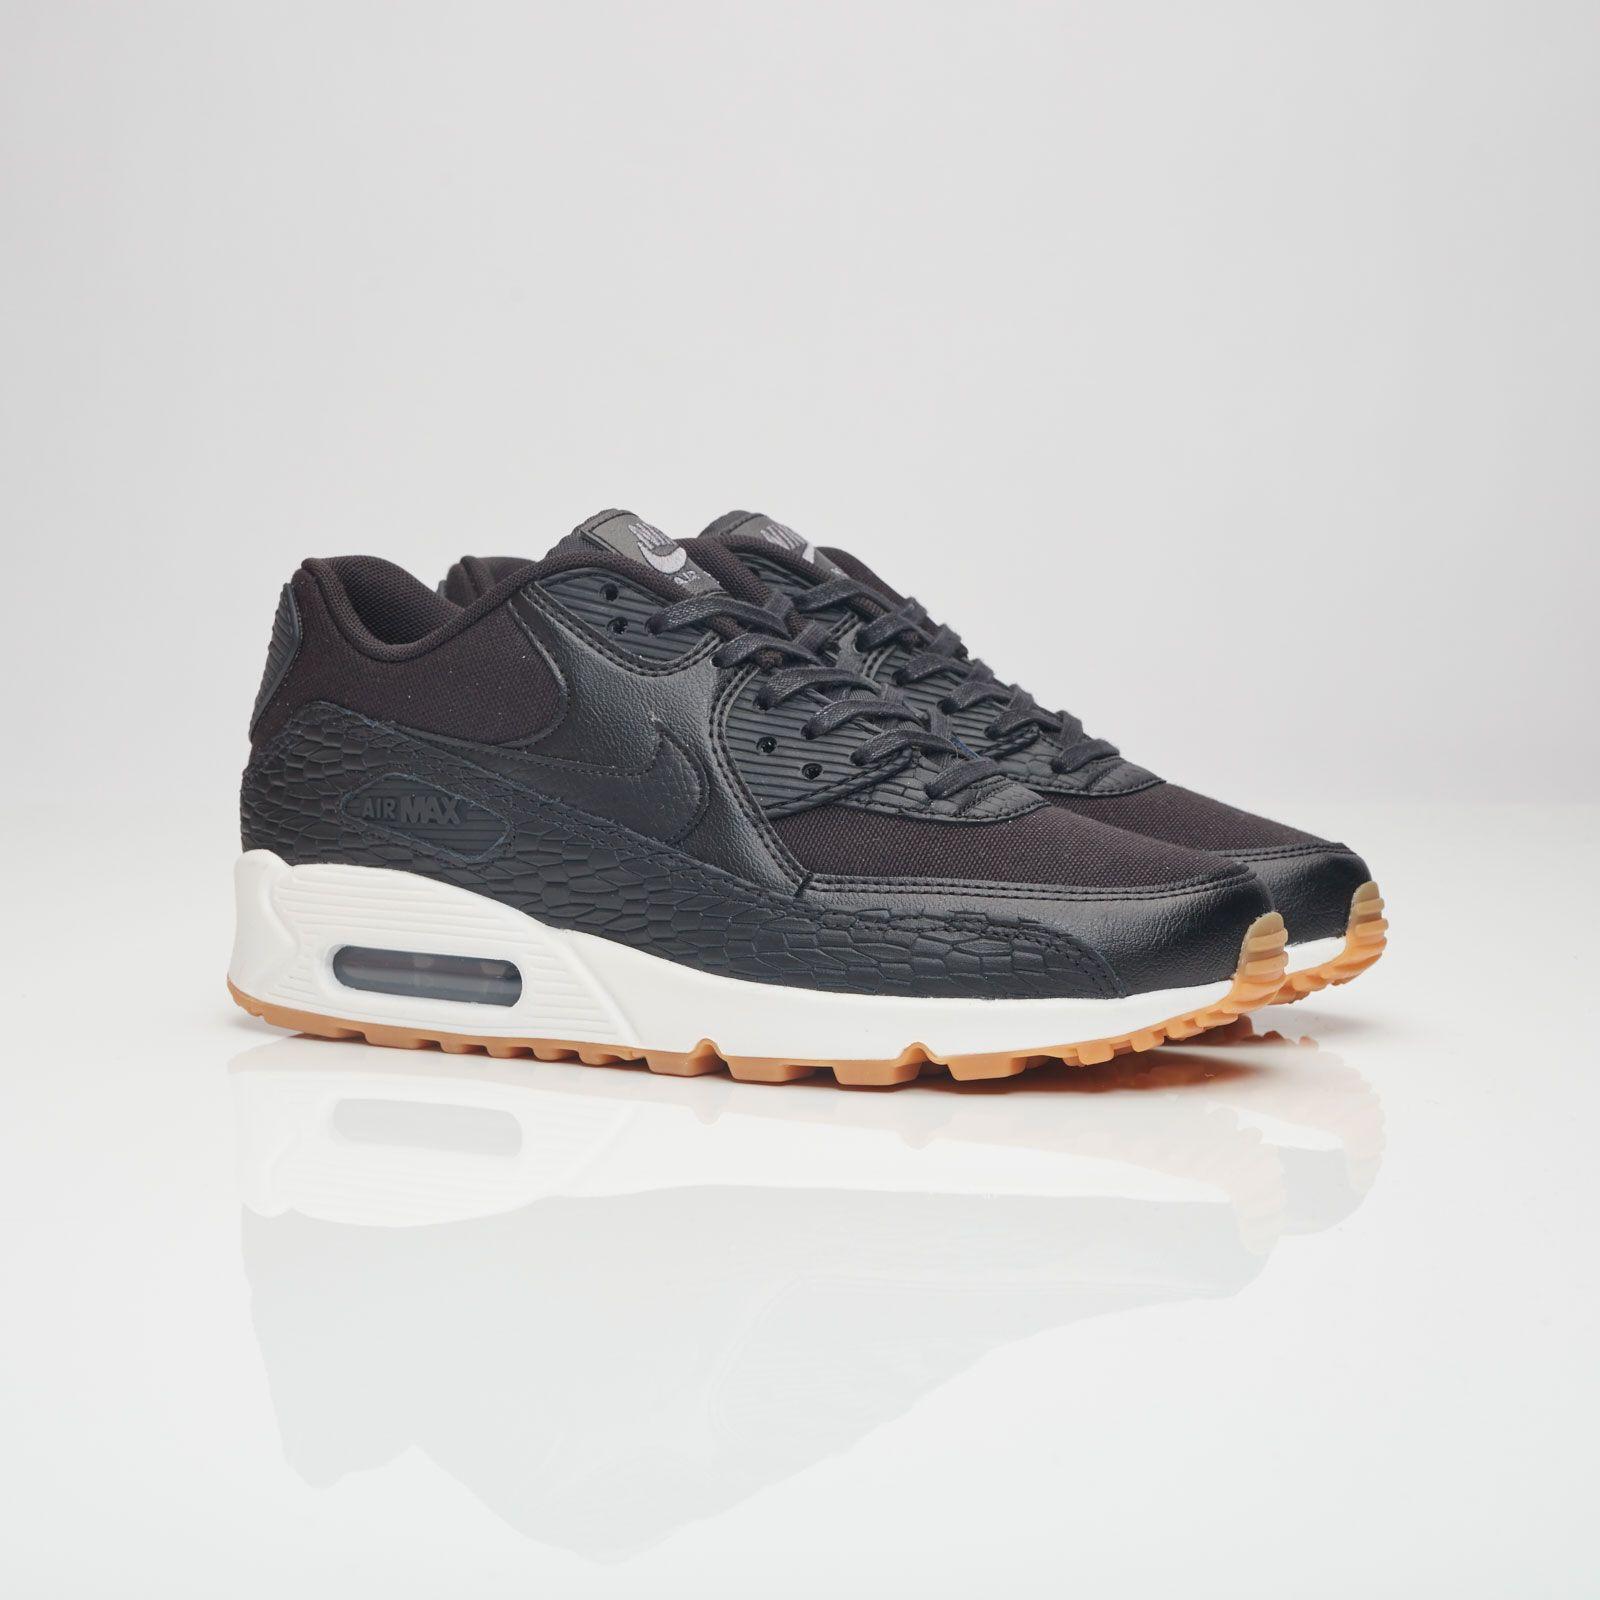 Nike Sportswear Wmns Air Max 90 Premium Leather | Nike